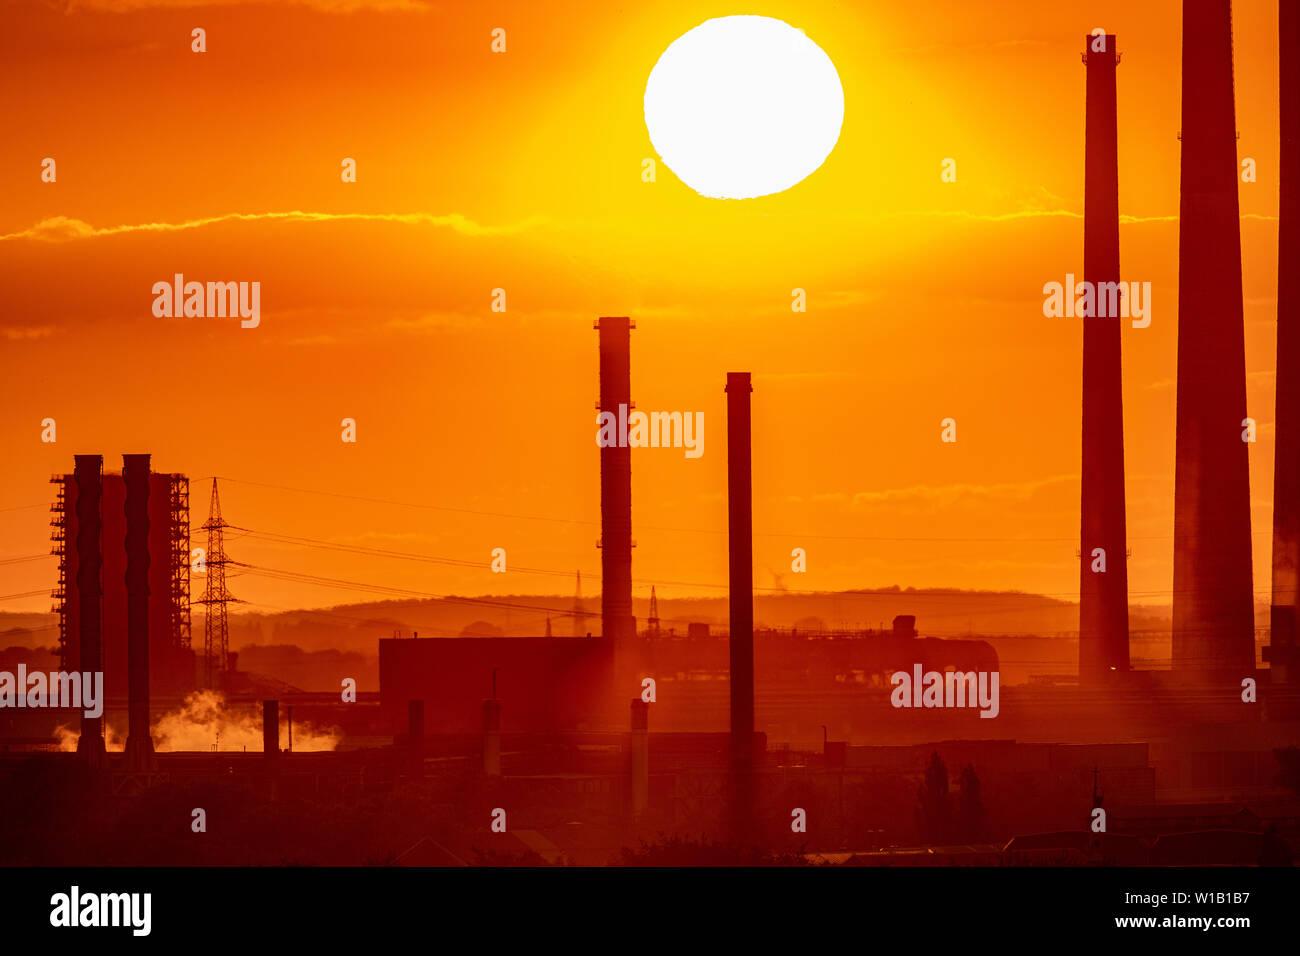 Sonnenuntergang im Ruhrgebiet Stockbild